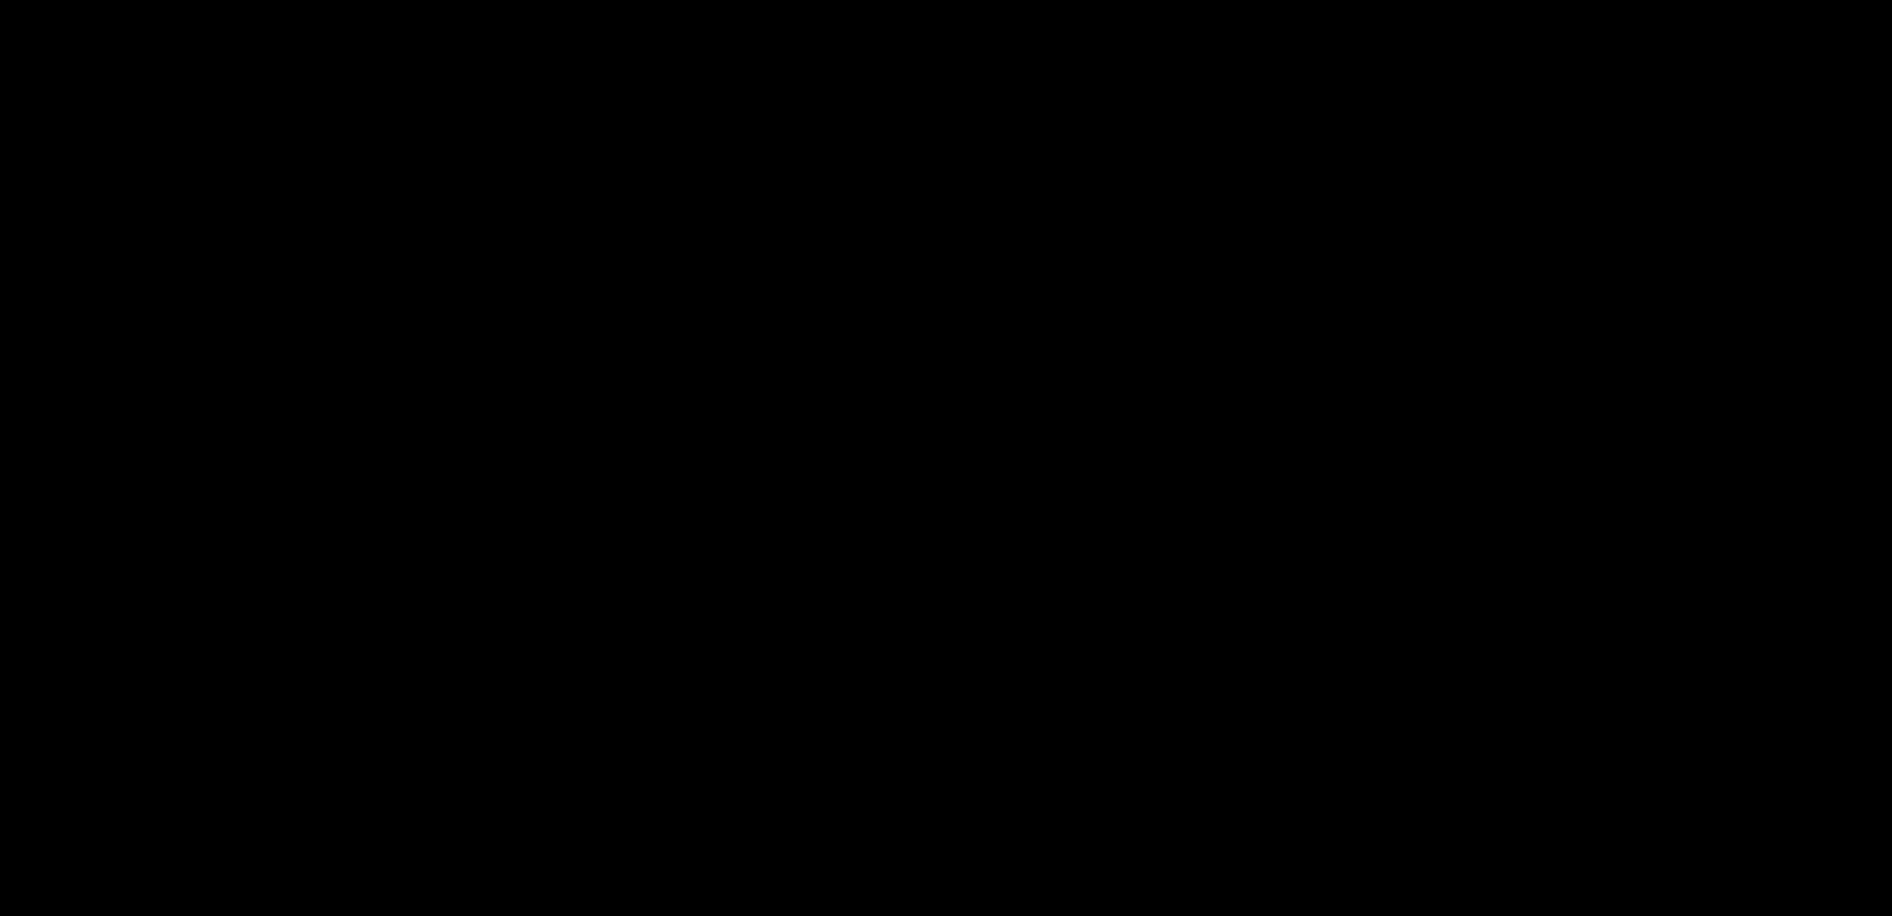 Phenolphthalein β-D-glucuronide sodium salt